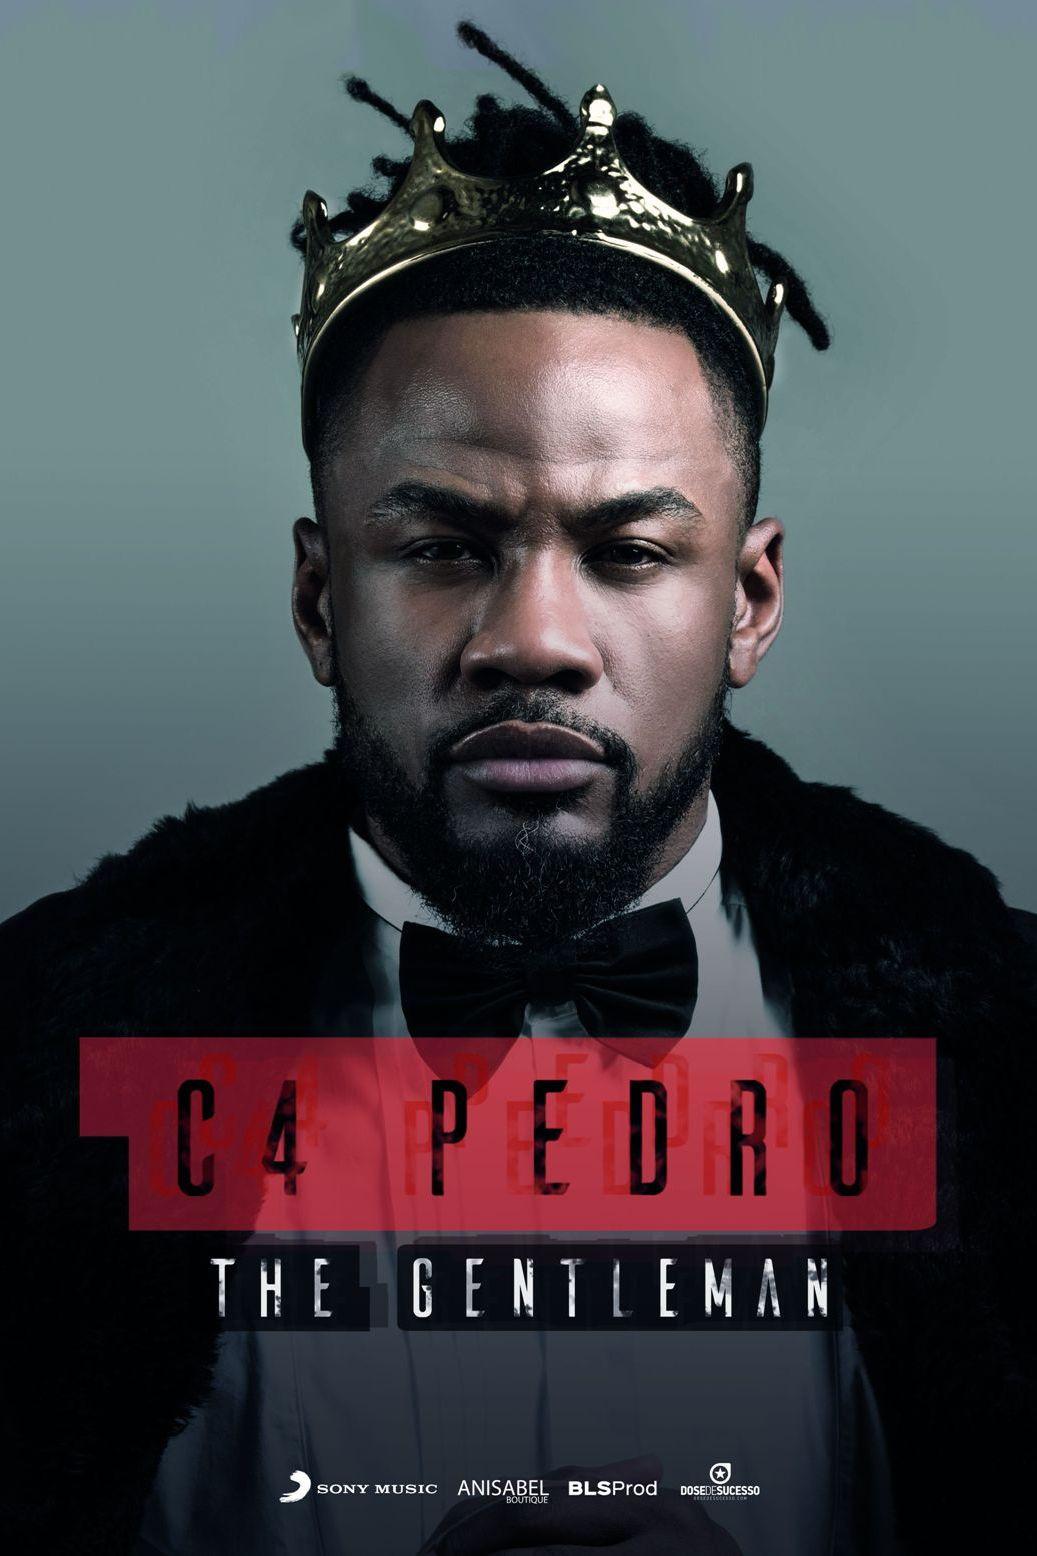 C4 Pedro dá concerto gratuito no Casino de Lisboa